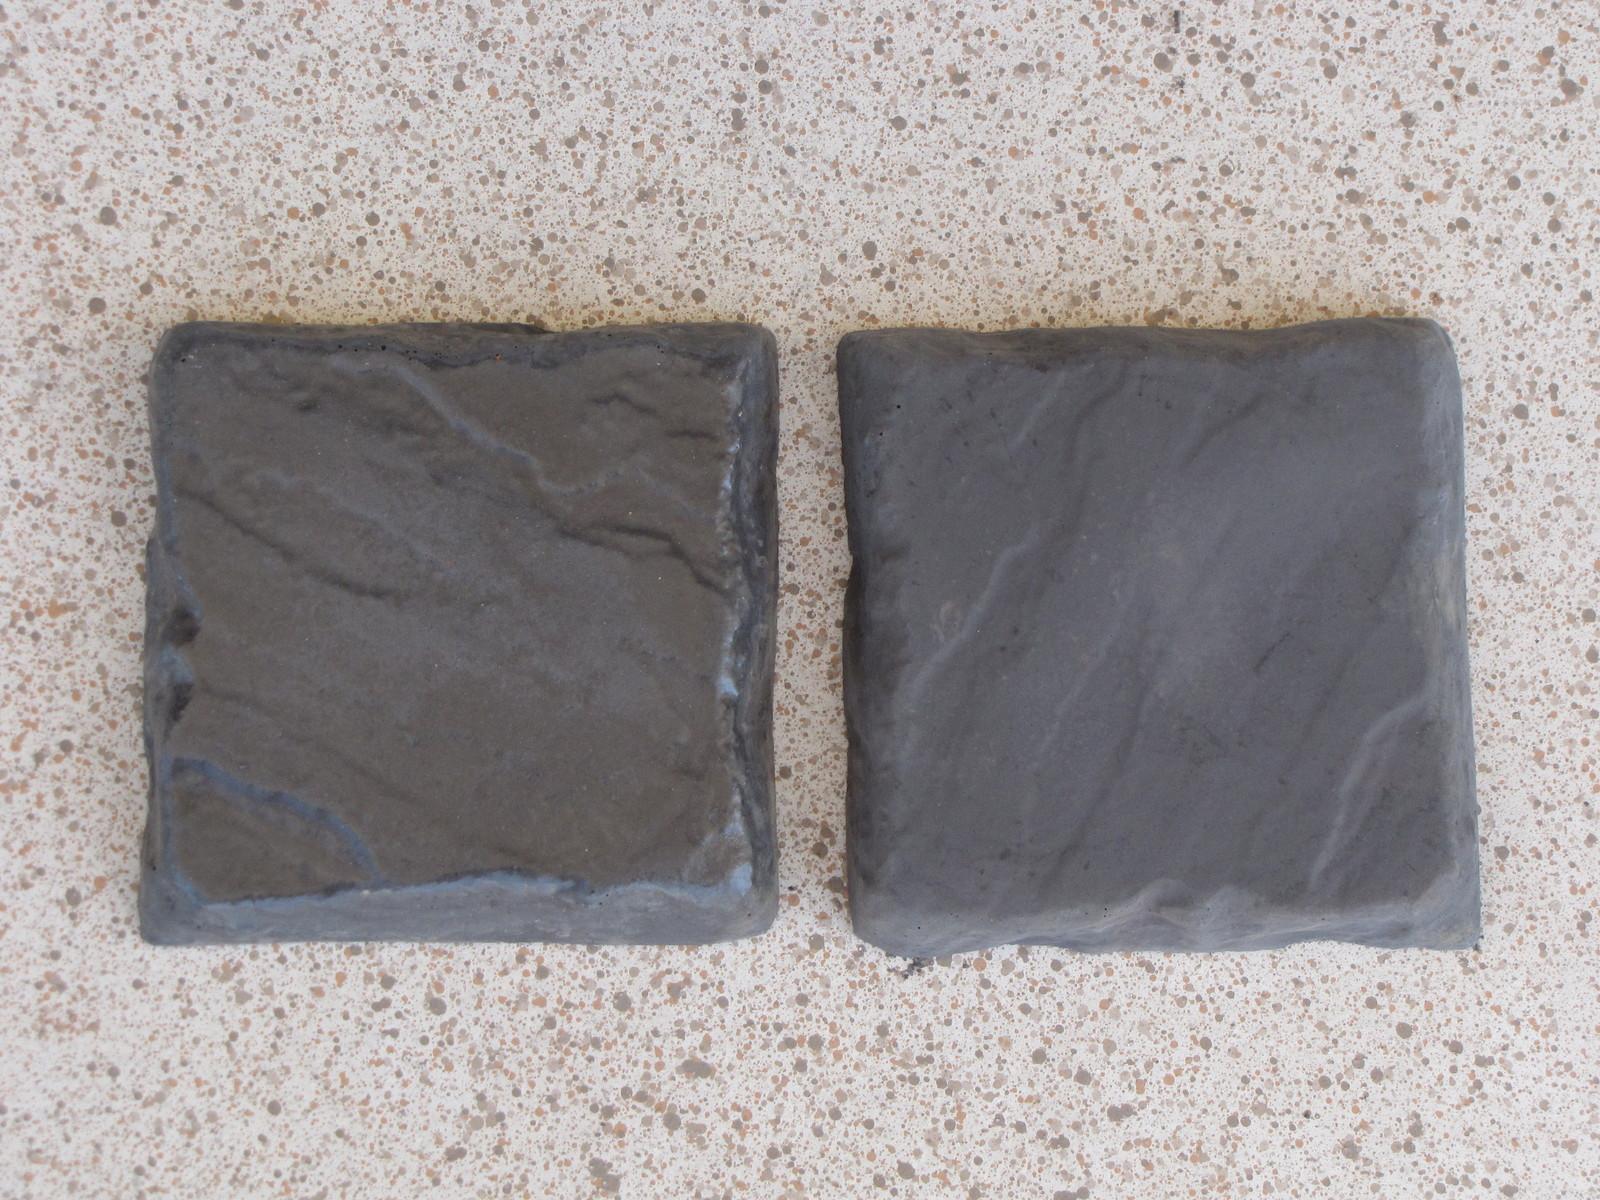 DIY PROJECT KIT MAKES 4x4x1.5 COBBLESTONE PAVERS W/24 PAVER MOLDS & ALL SUPPLIES